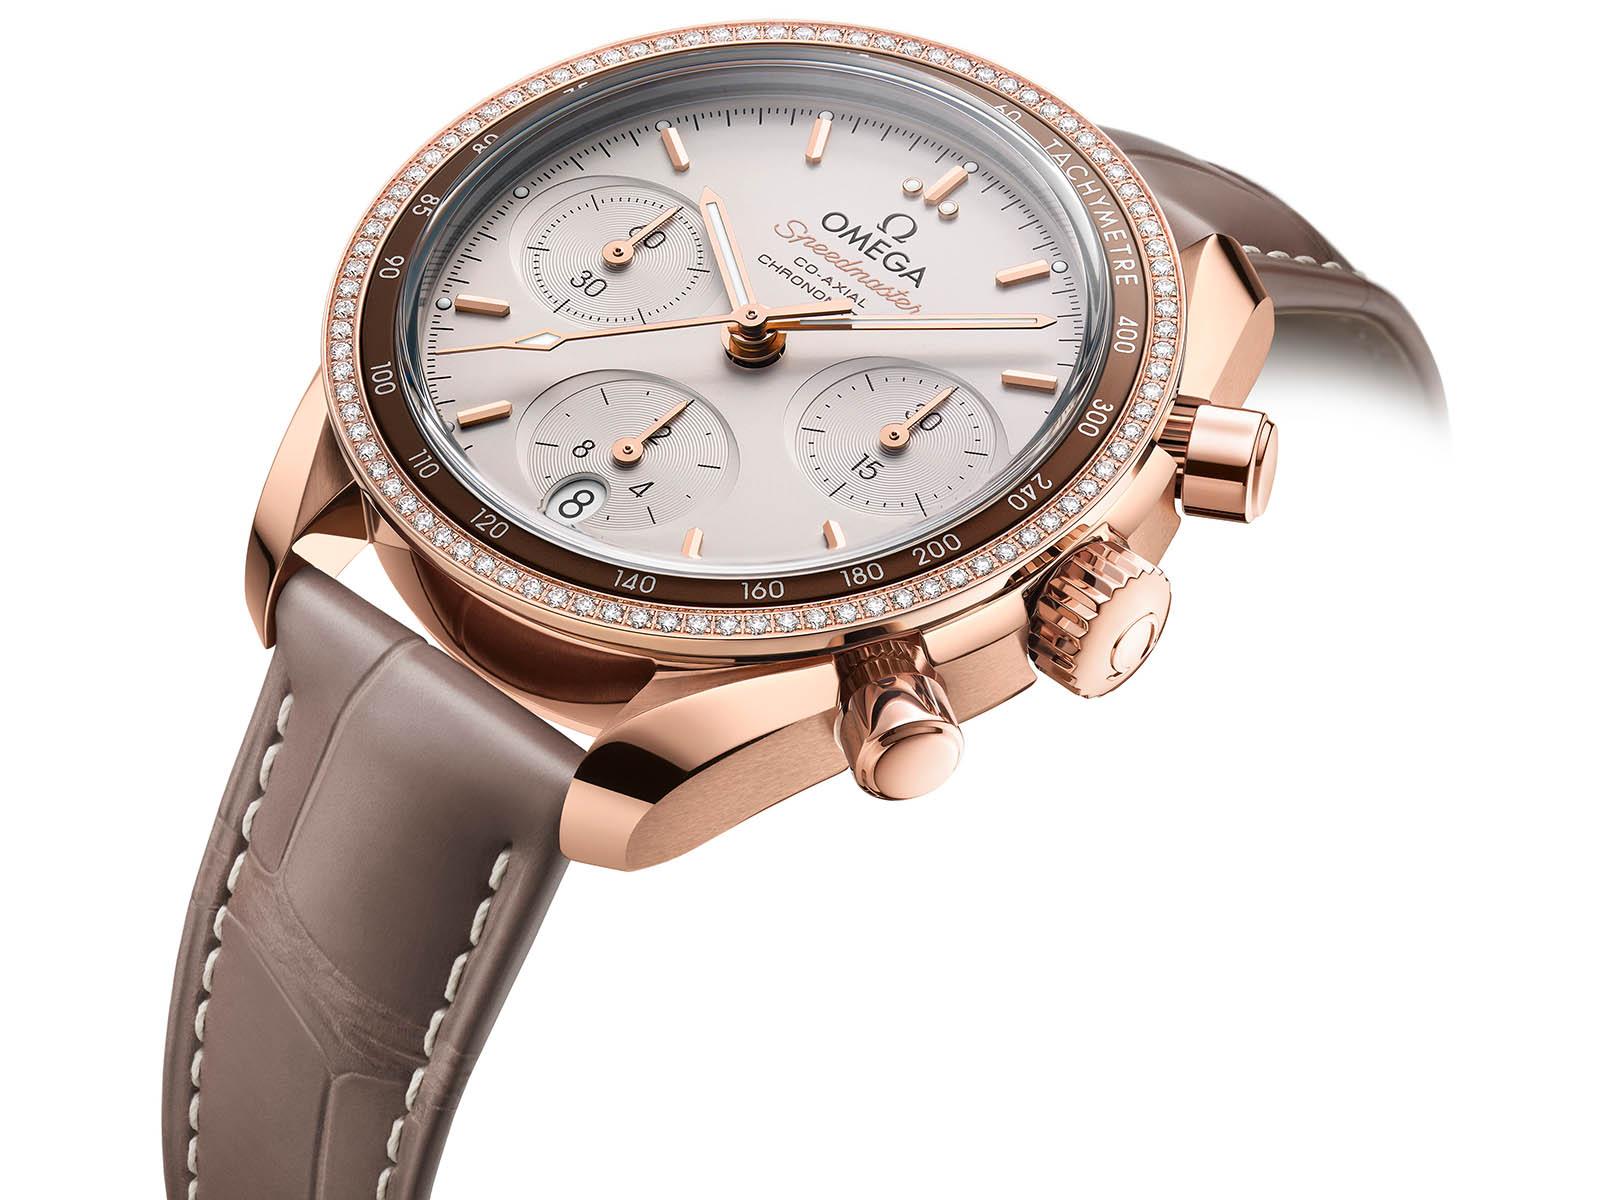 324-68-38-50-02-003-omega-speedmaster-38-co-axial-chronograph-38mm-sedna-gold-diamond-5.jpg